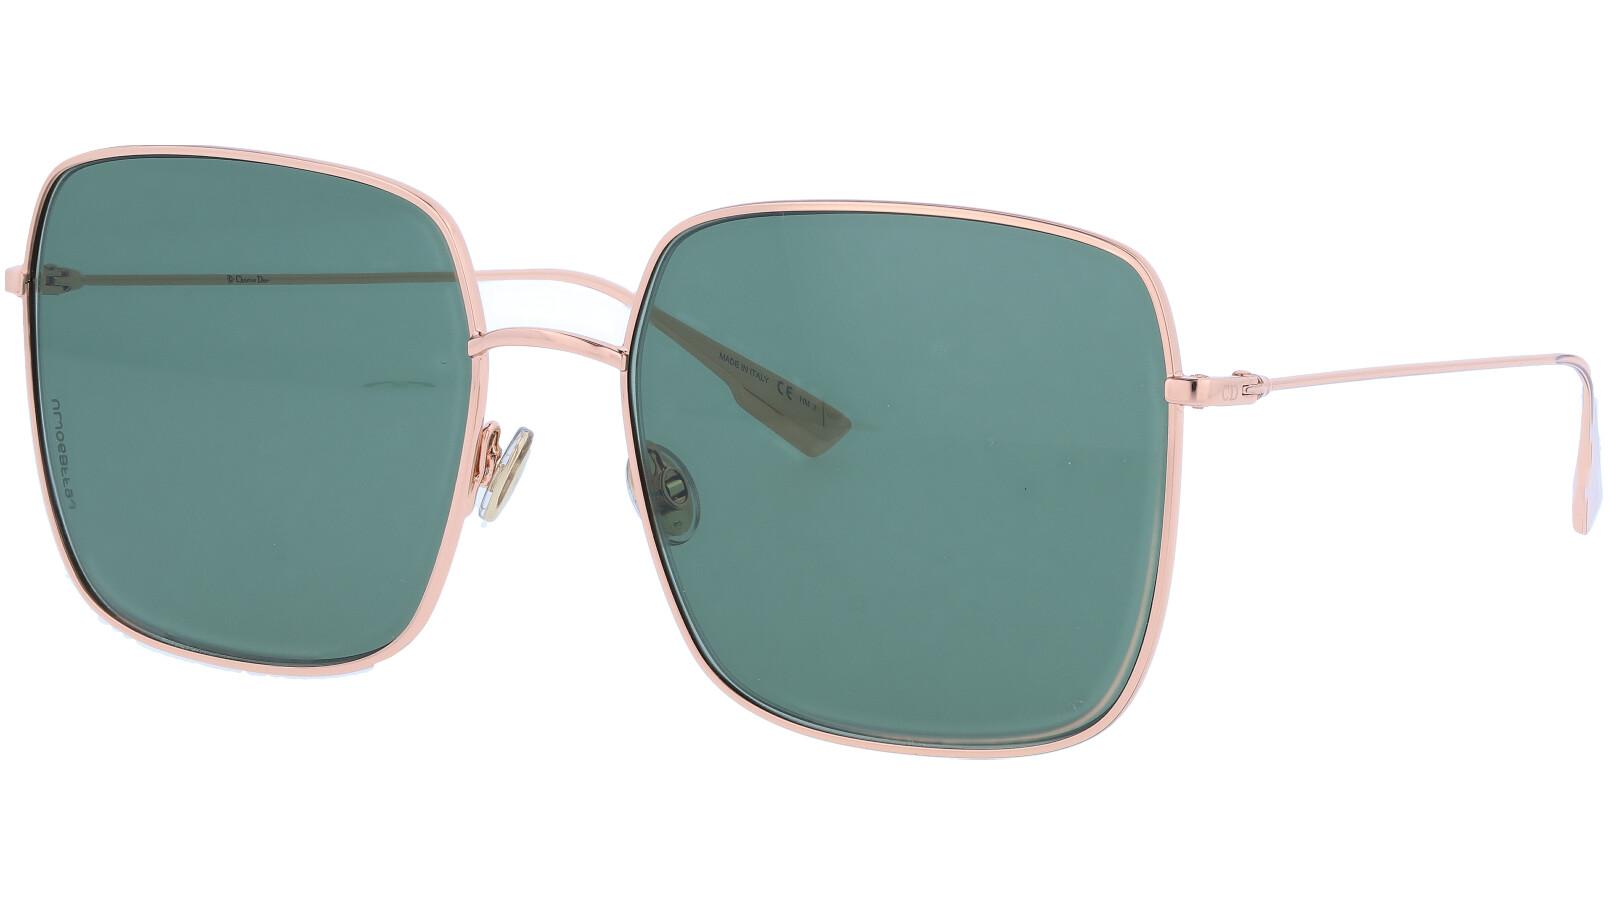 DIOR DIORSTELLAIRE1 LKSA9 59 GOLD Sunglasses